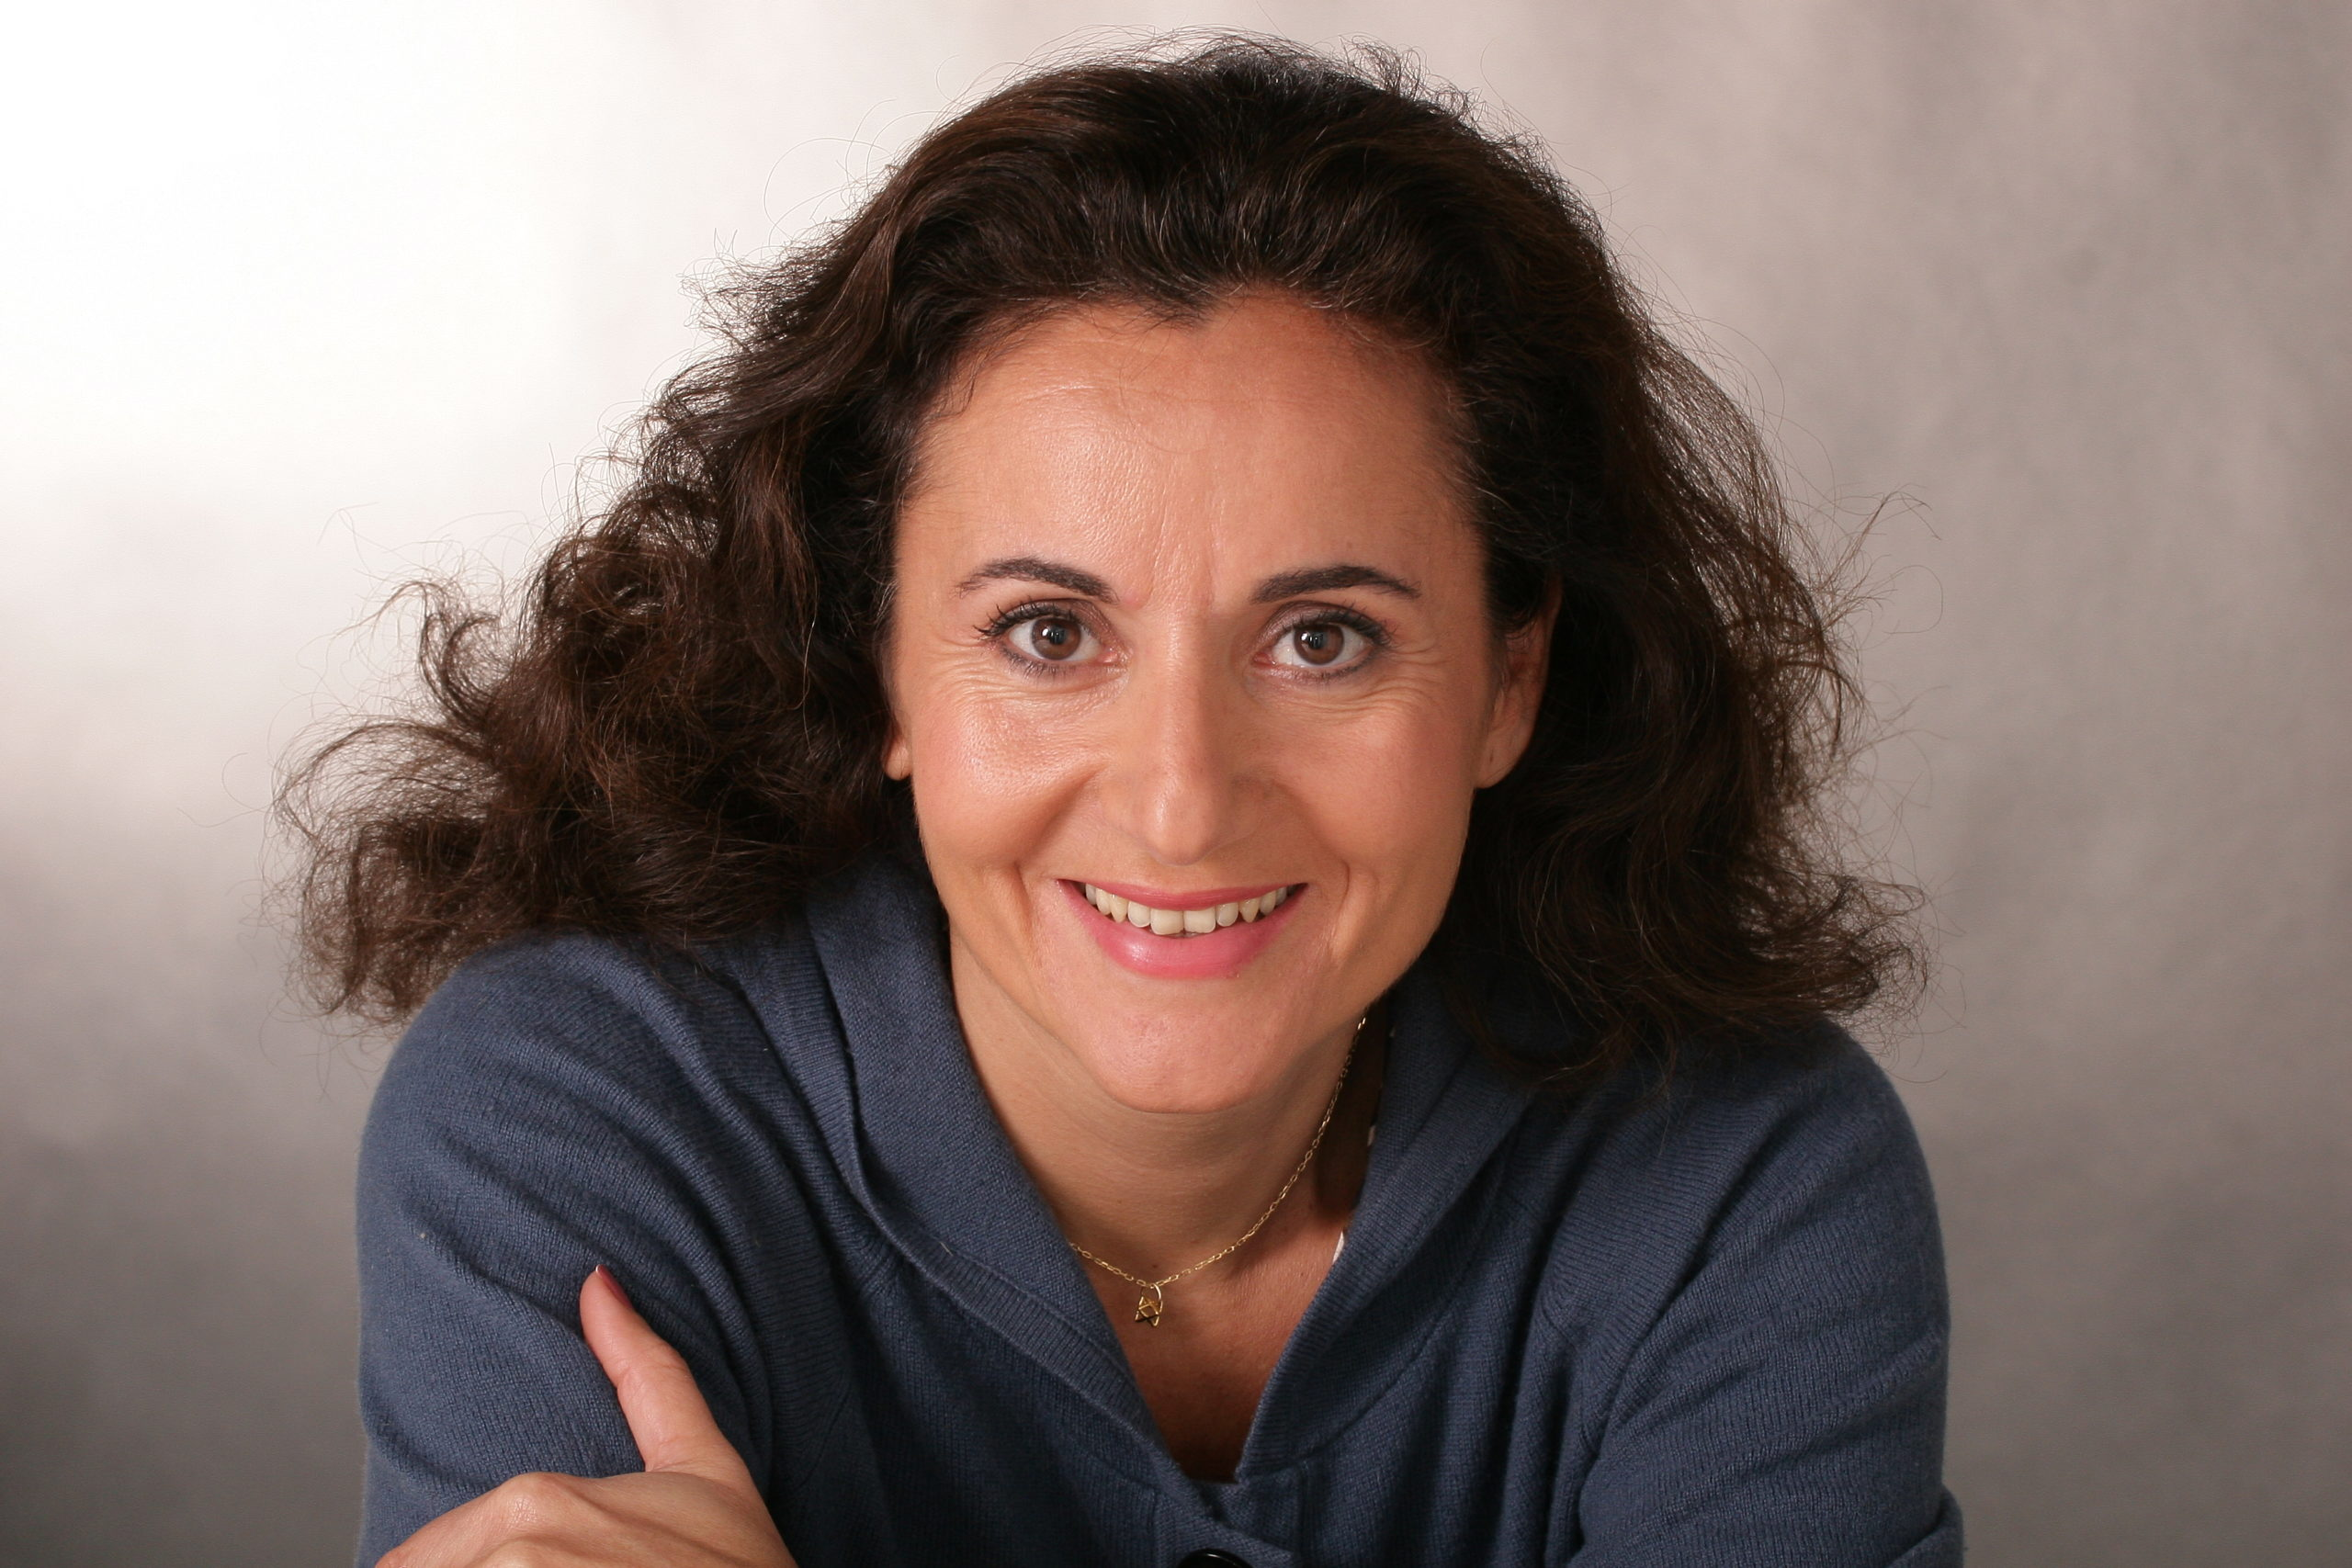 Nathalie Adhera